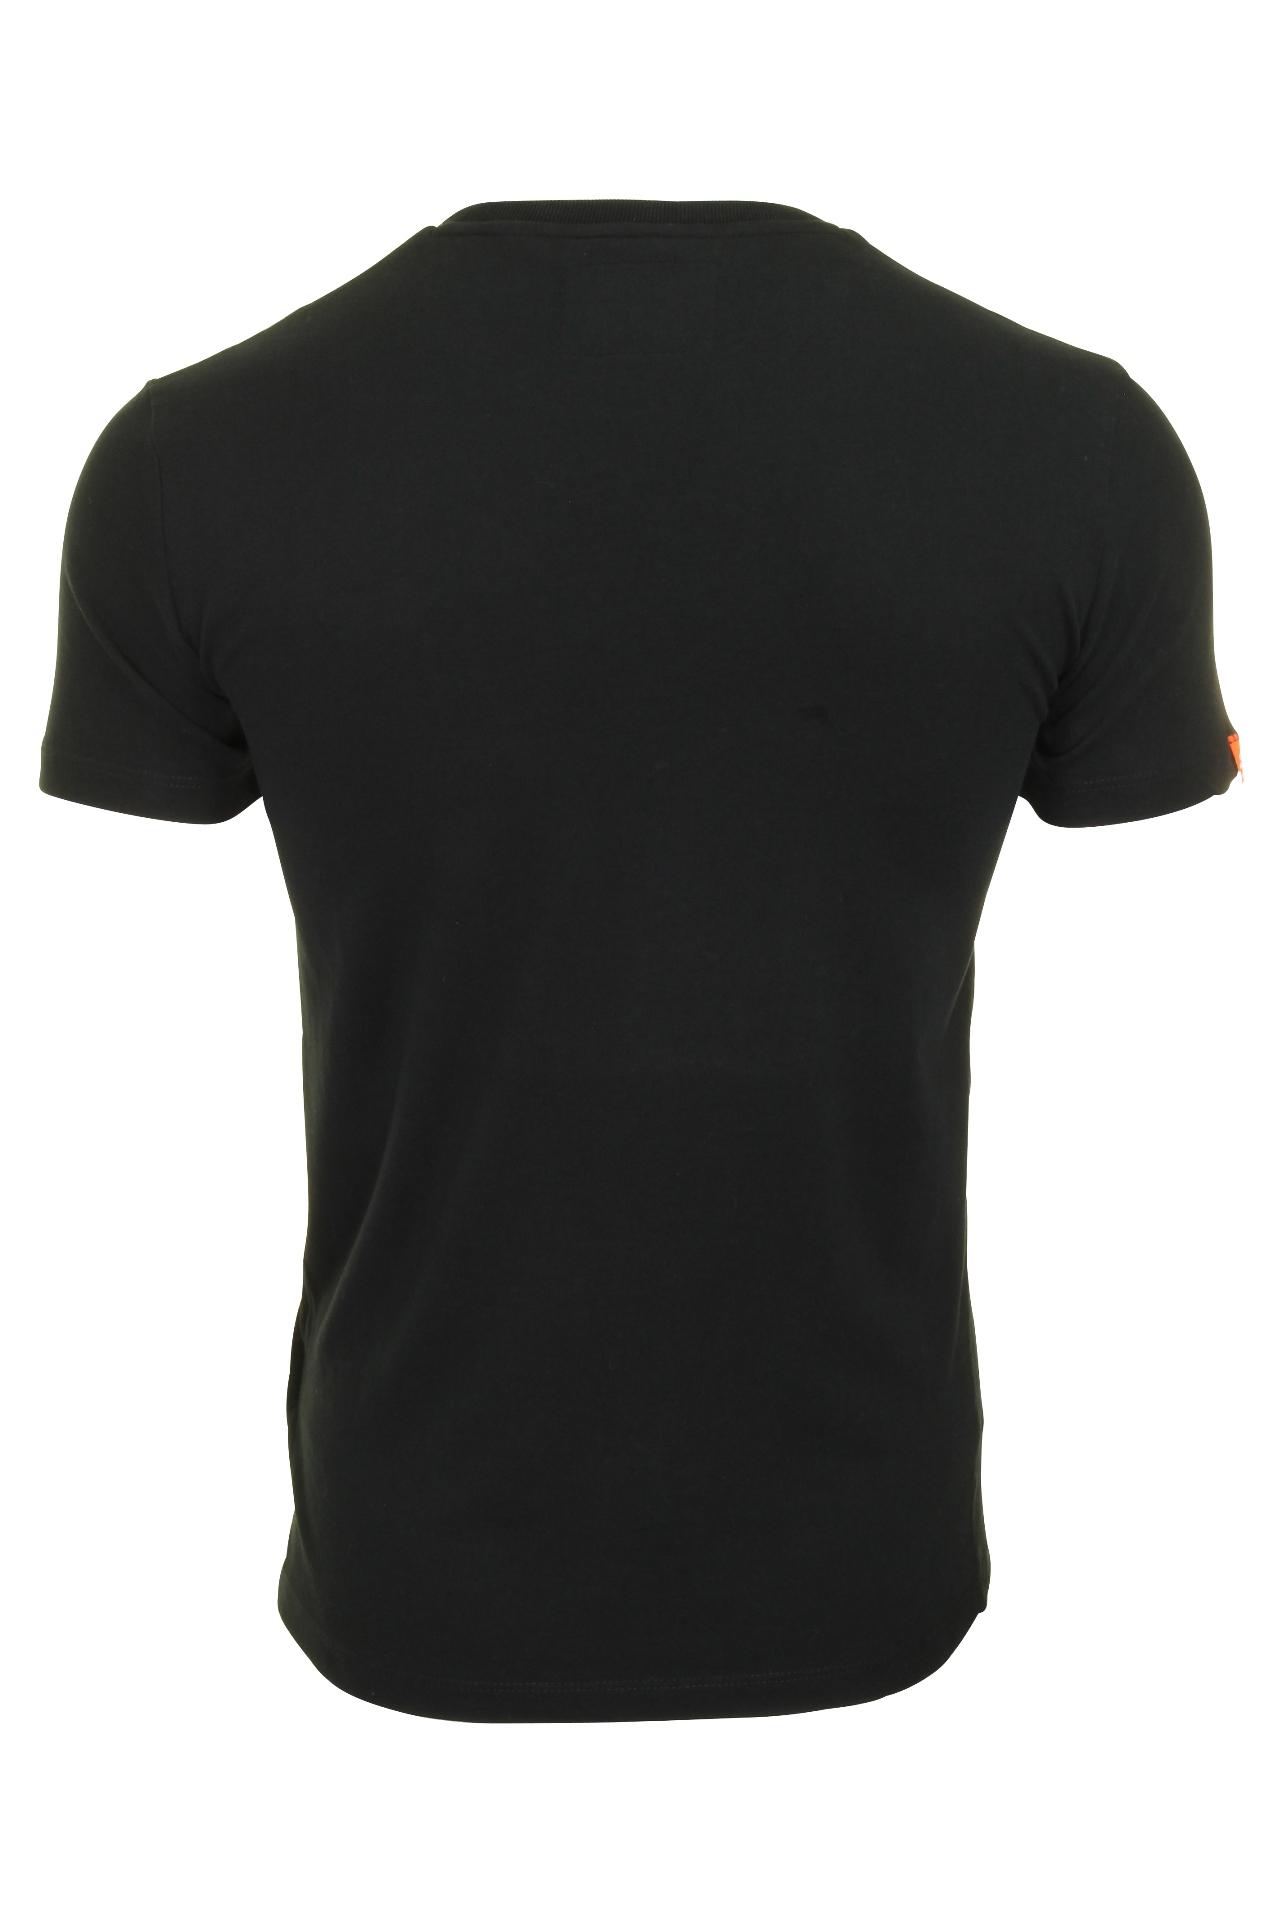 Top-Superdry-Orange-Label-Da-Uomo-039-Vintage-039-T-shirt-girocollo miniatura 5